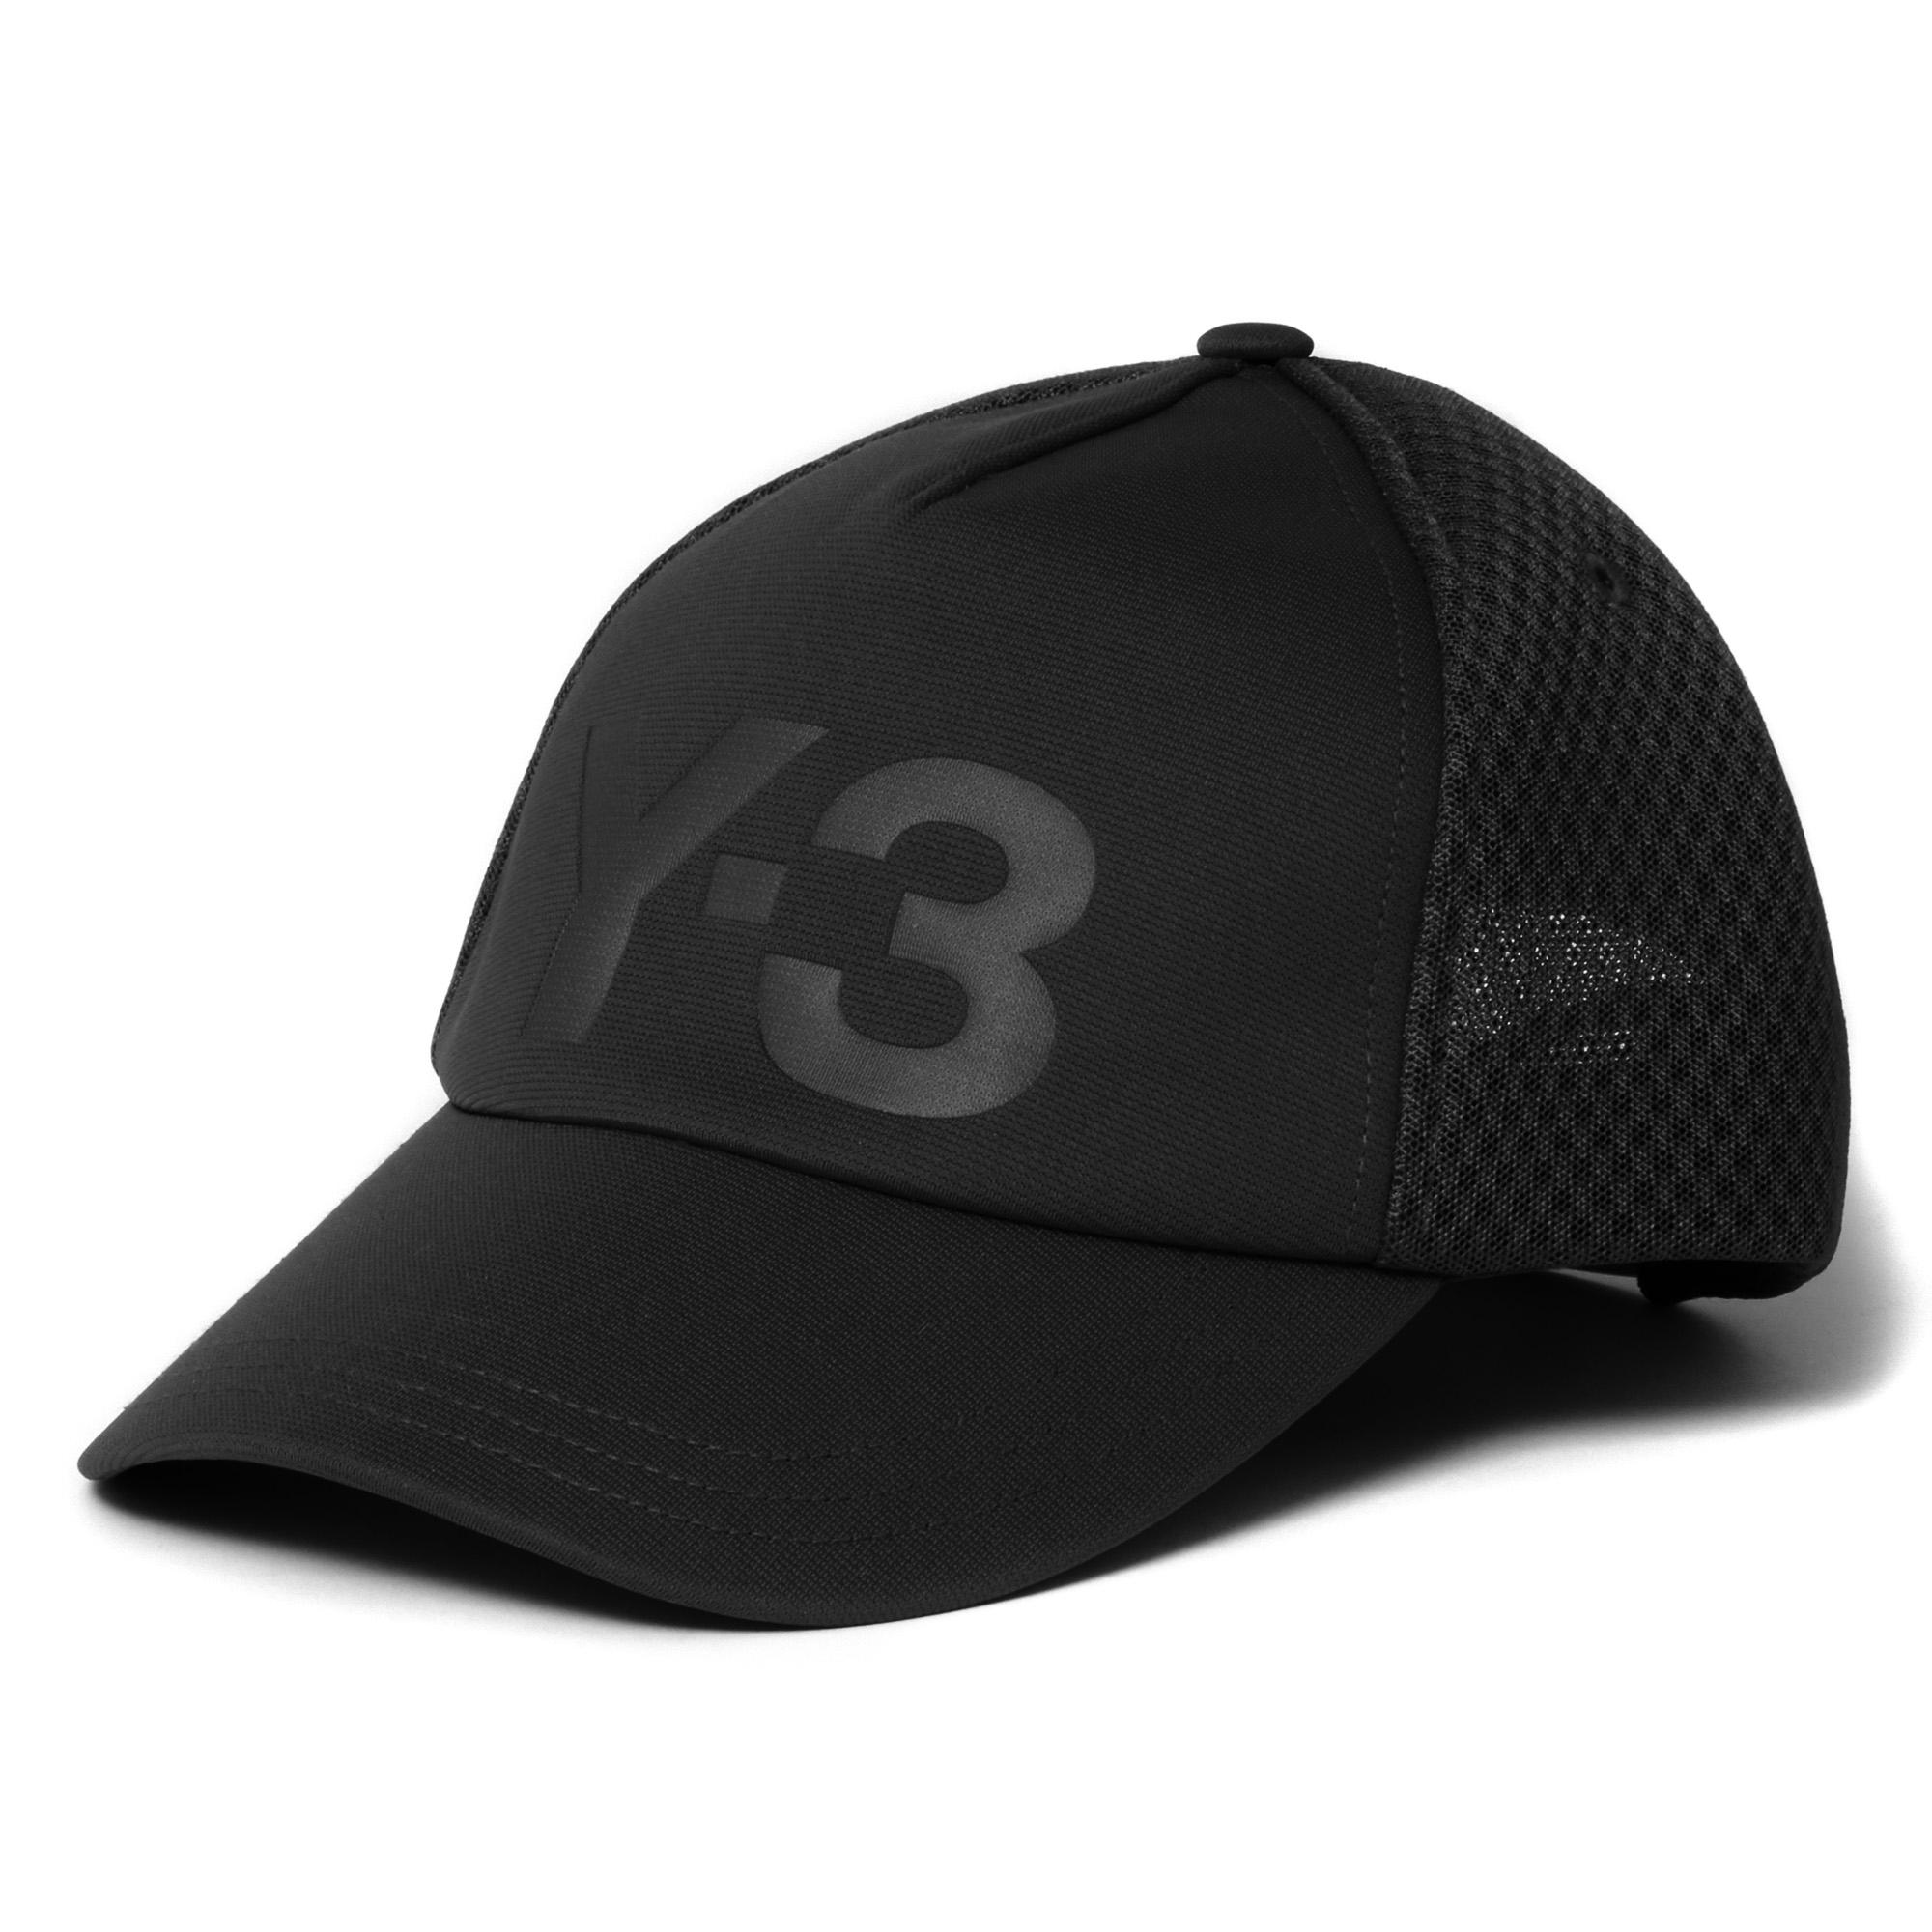 5cb494584 Lyst - Y-3 Black Classic Trucker Cap in Black for Men